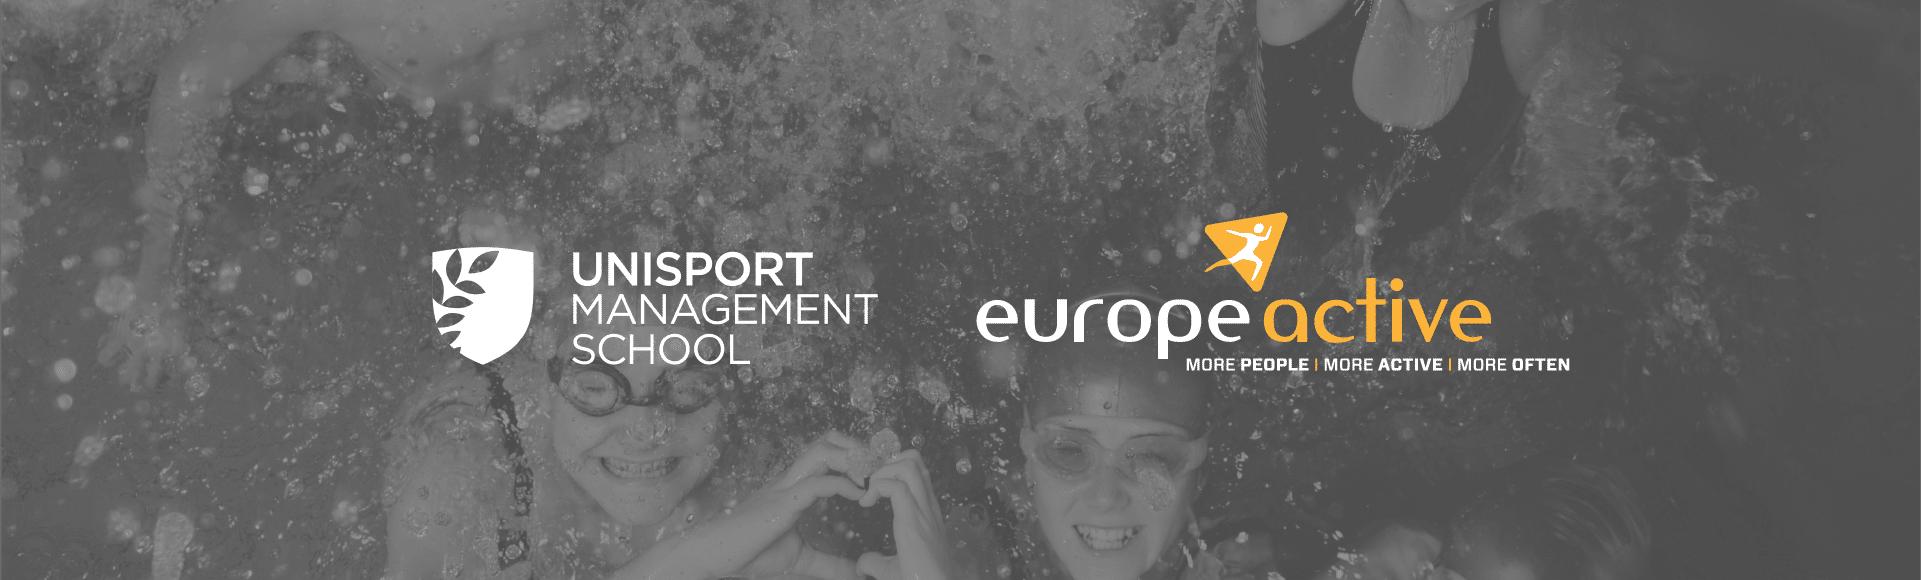 Unisport Management School se suma al manifiesto de EuropeActive